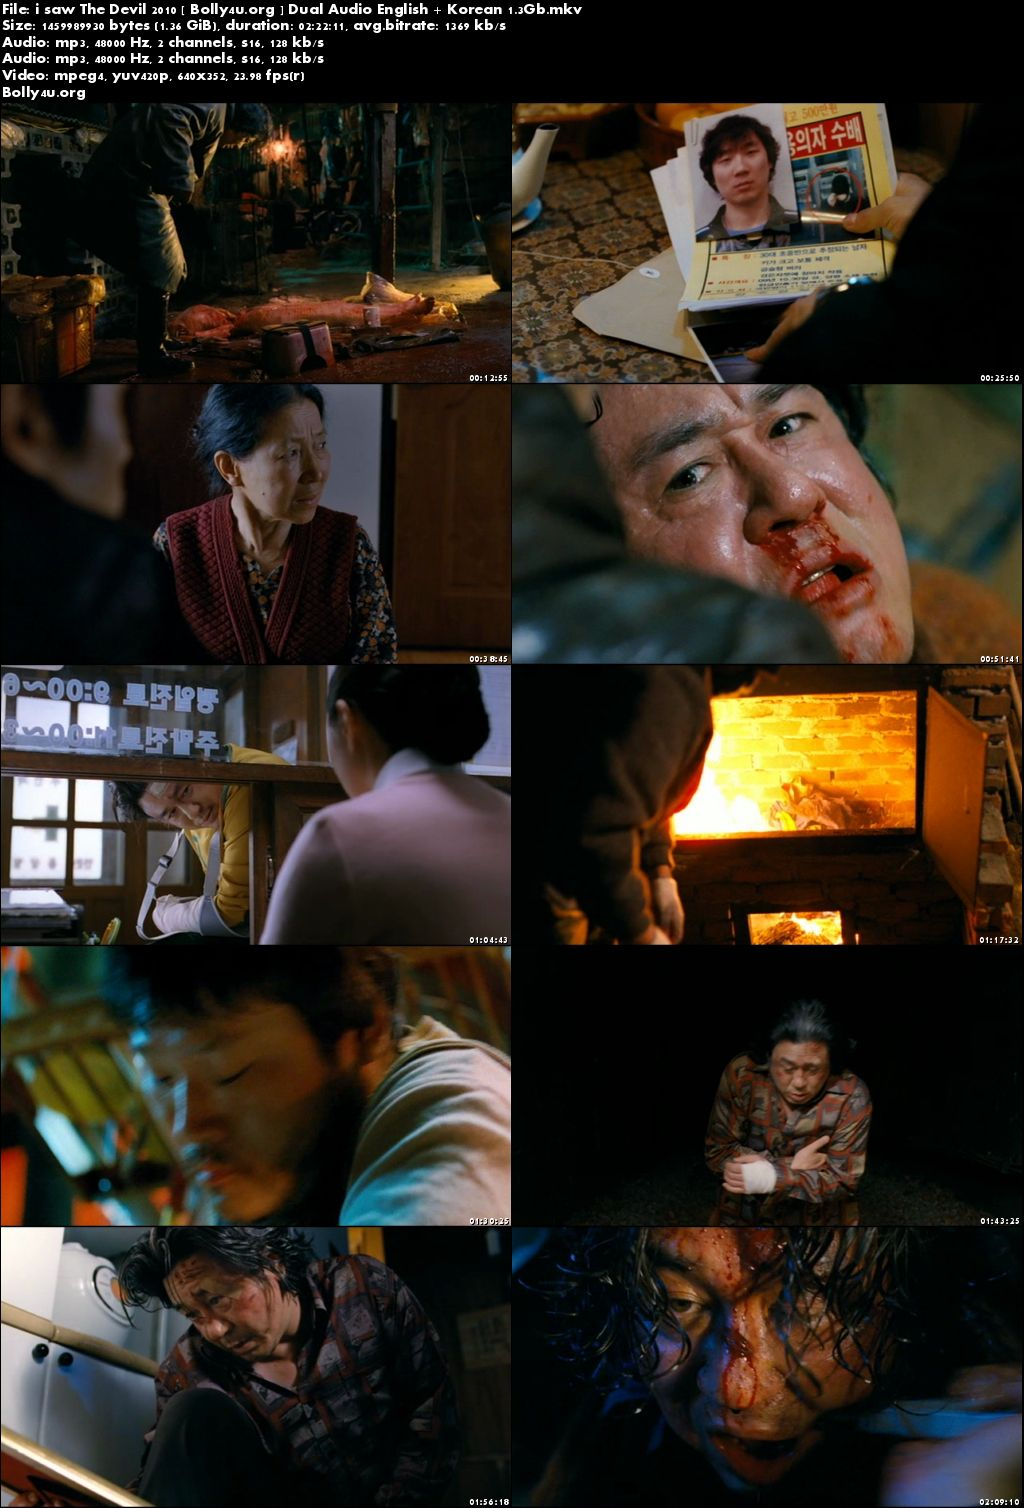 I Saw The Devil 2010 DVDRip 400MB English Korean Dual Audio 480p Download